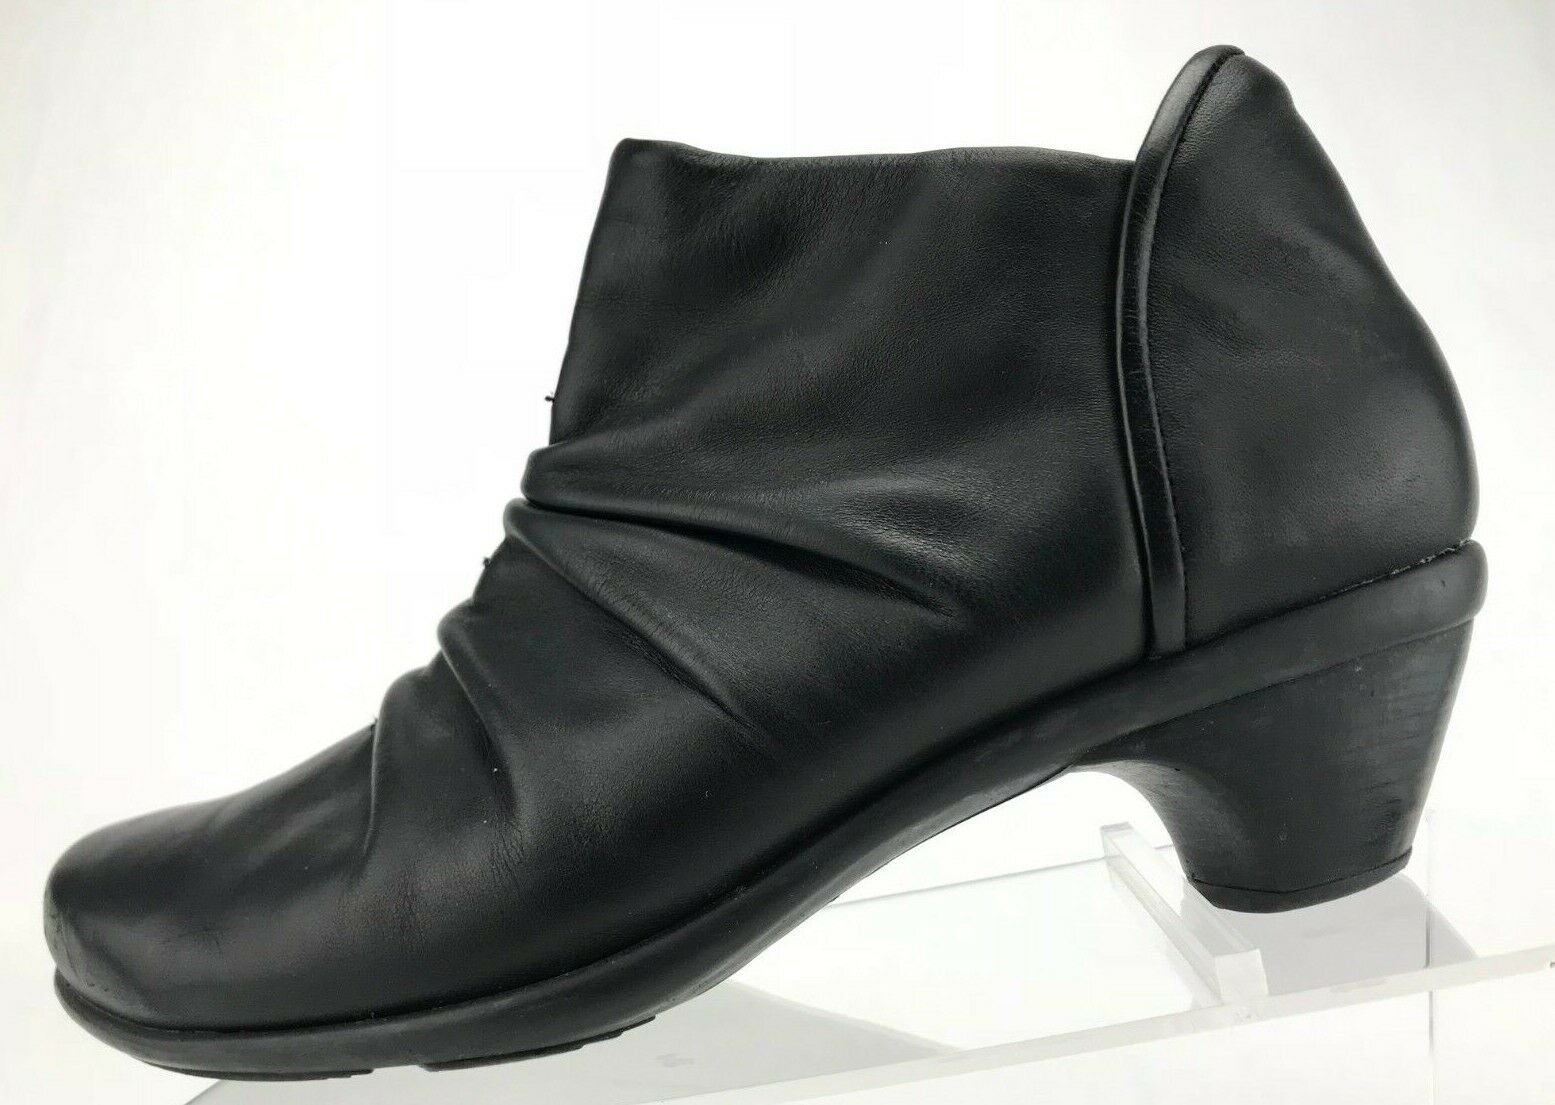 Naot botas al tobillo moda Cuero Negro Cremallera Lateral Lateral Lateral Slouch Botines para mujer 40 9,9 .5  primera reputación de los clientes primero